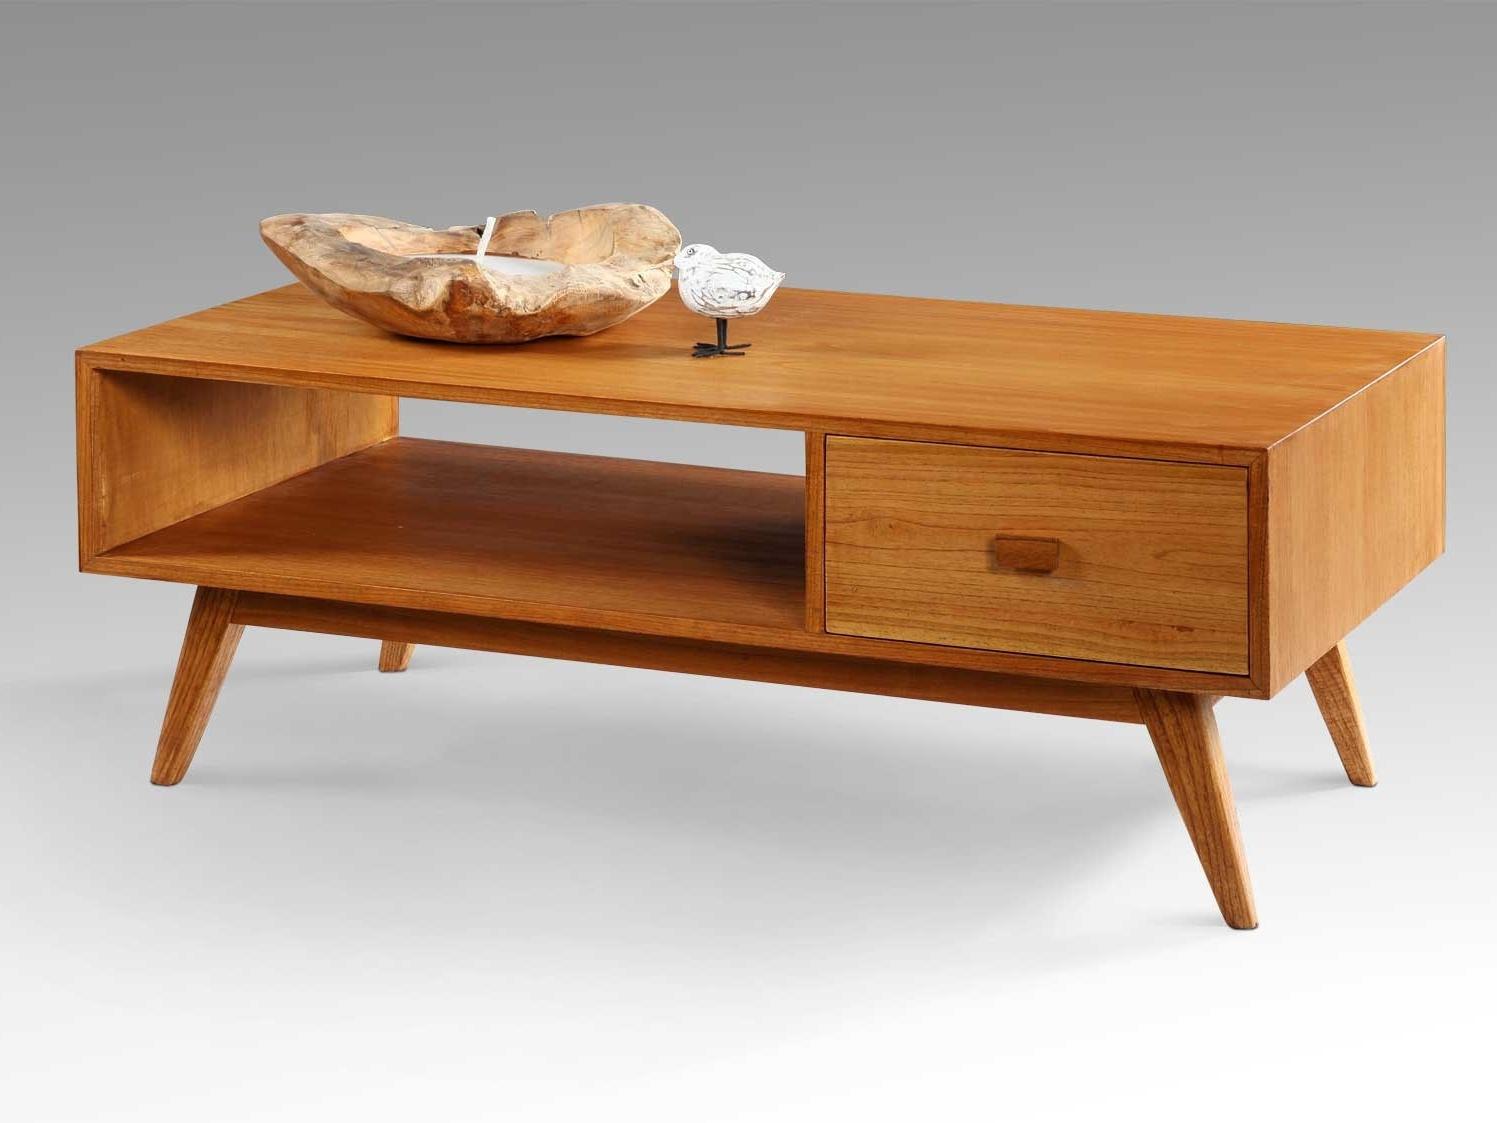 Retro Coffee Table With Open Shelf